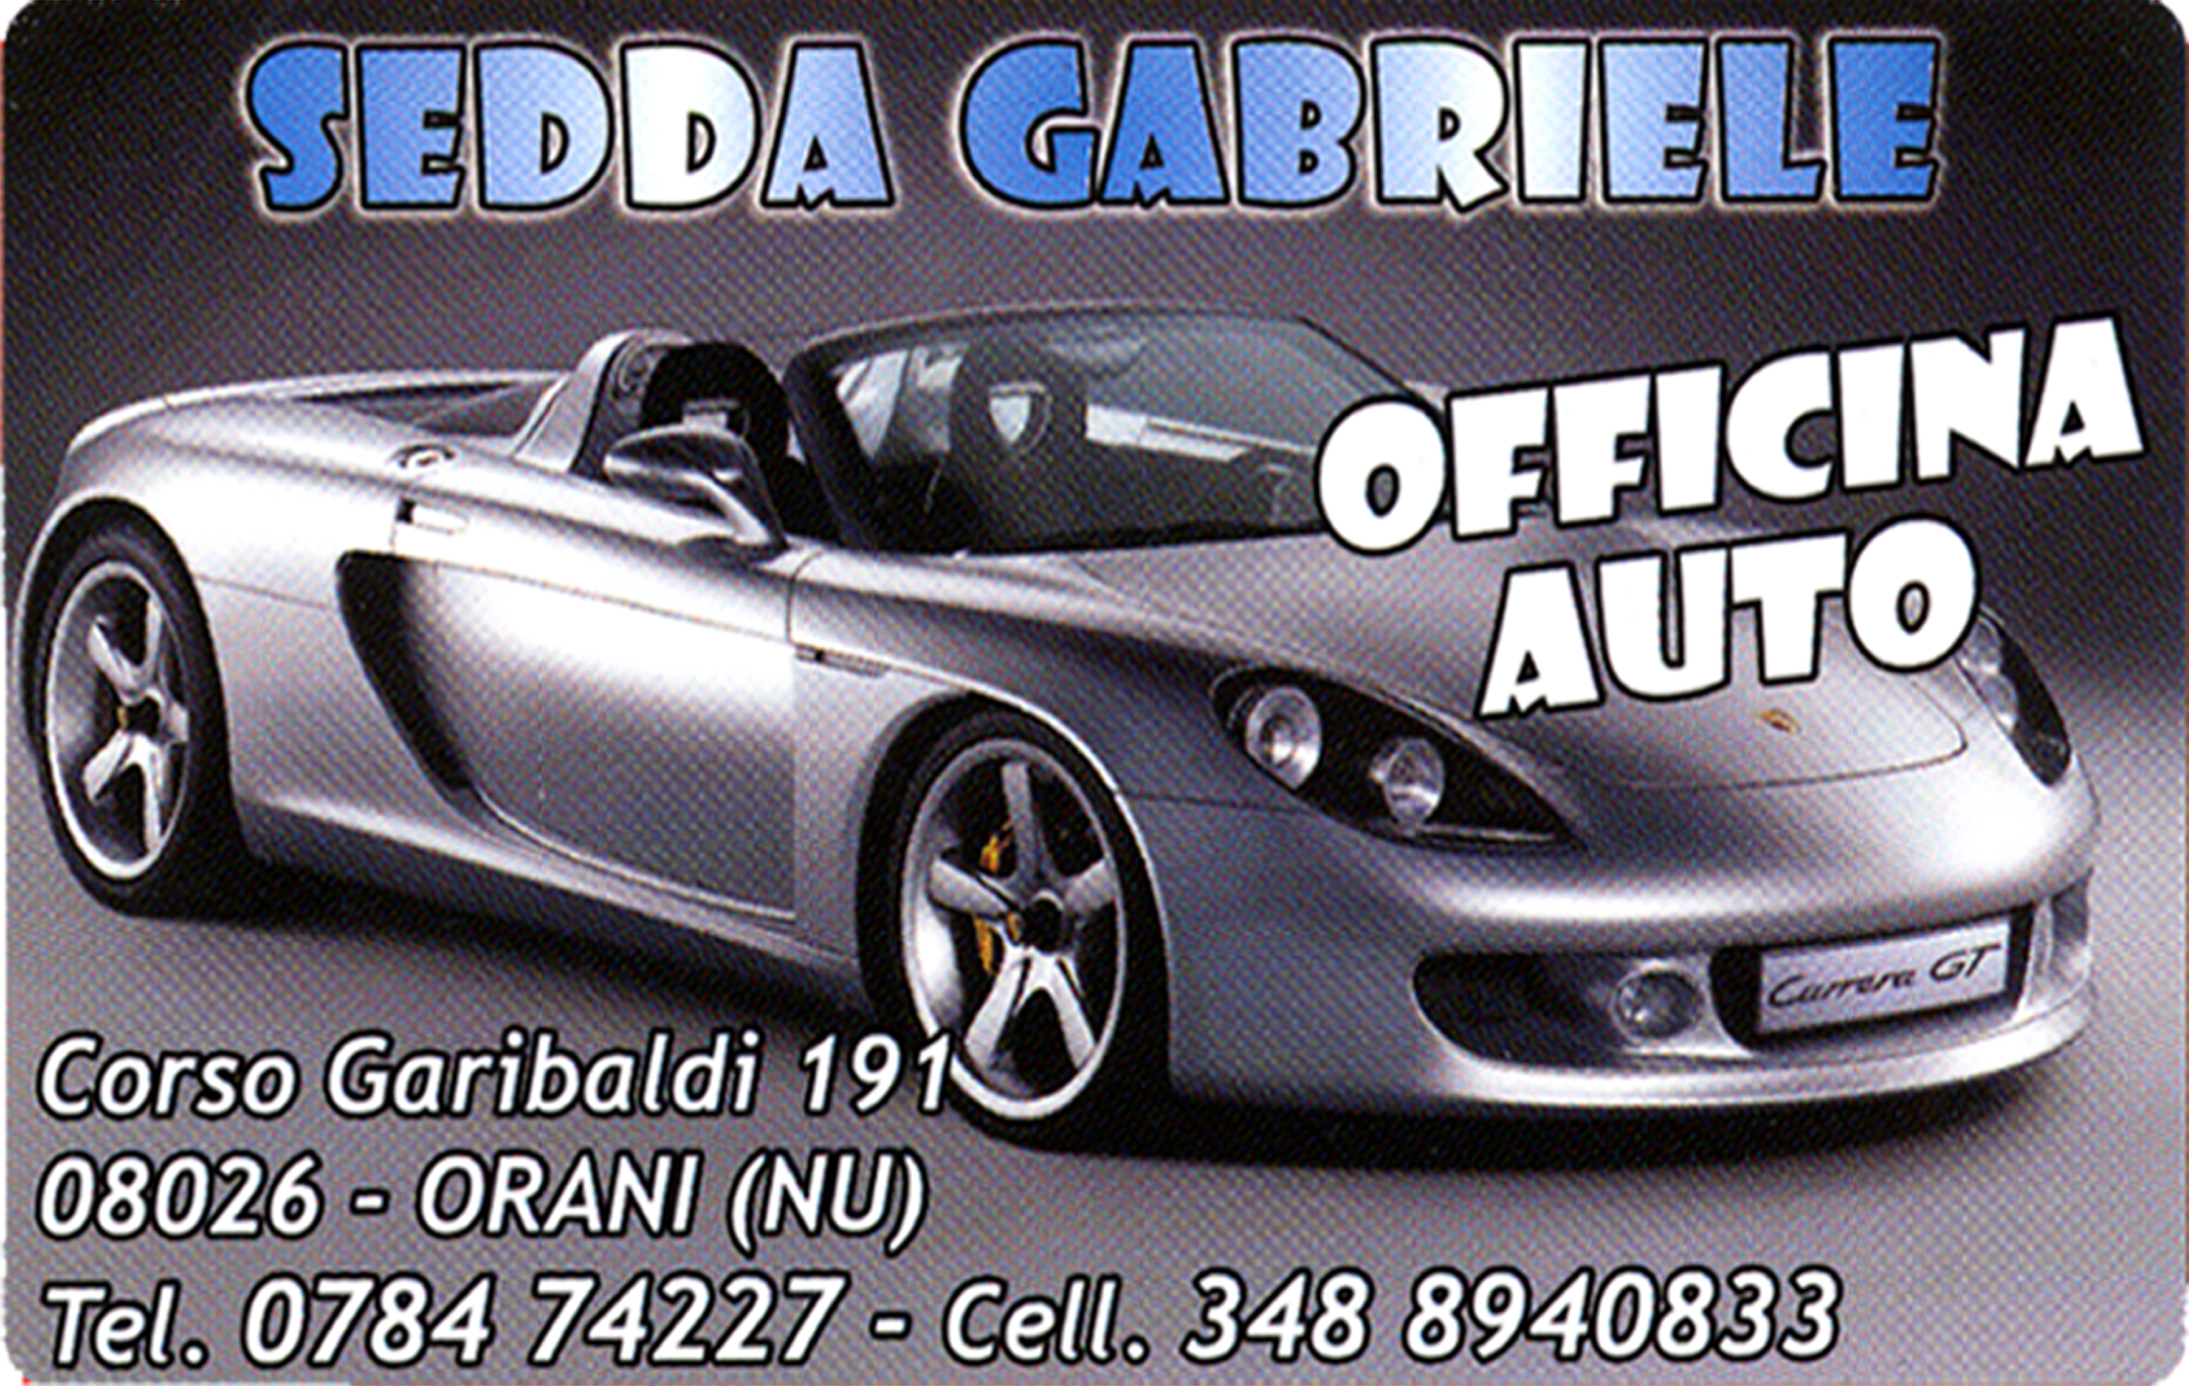 logo Auto officina di Gabriele Sedda